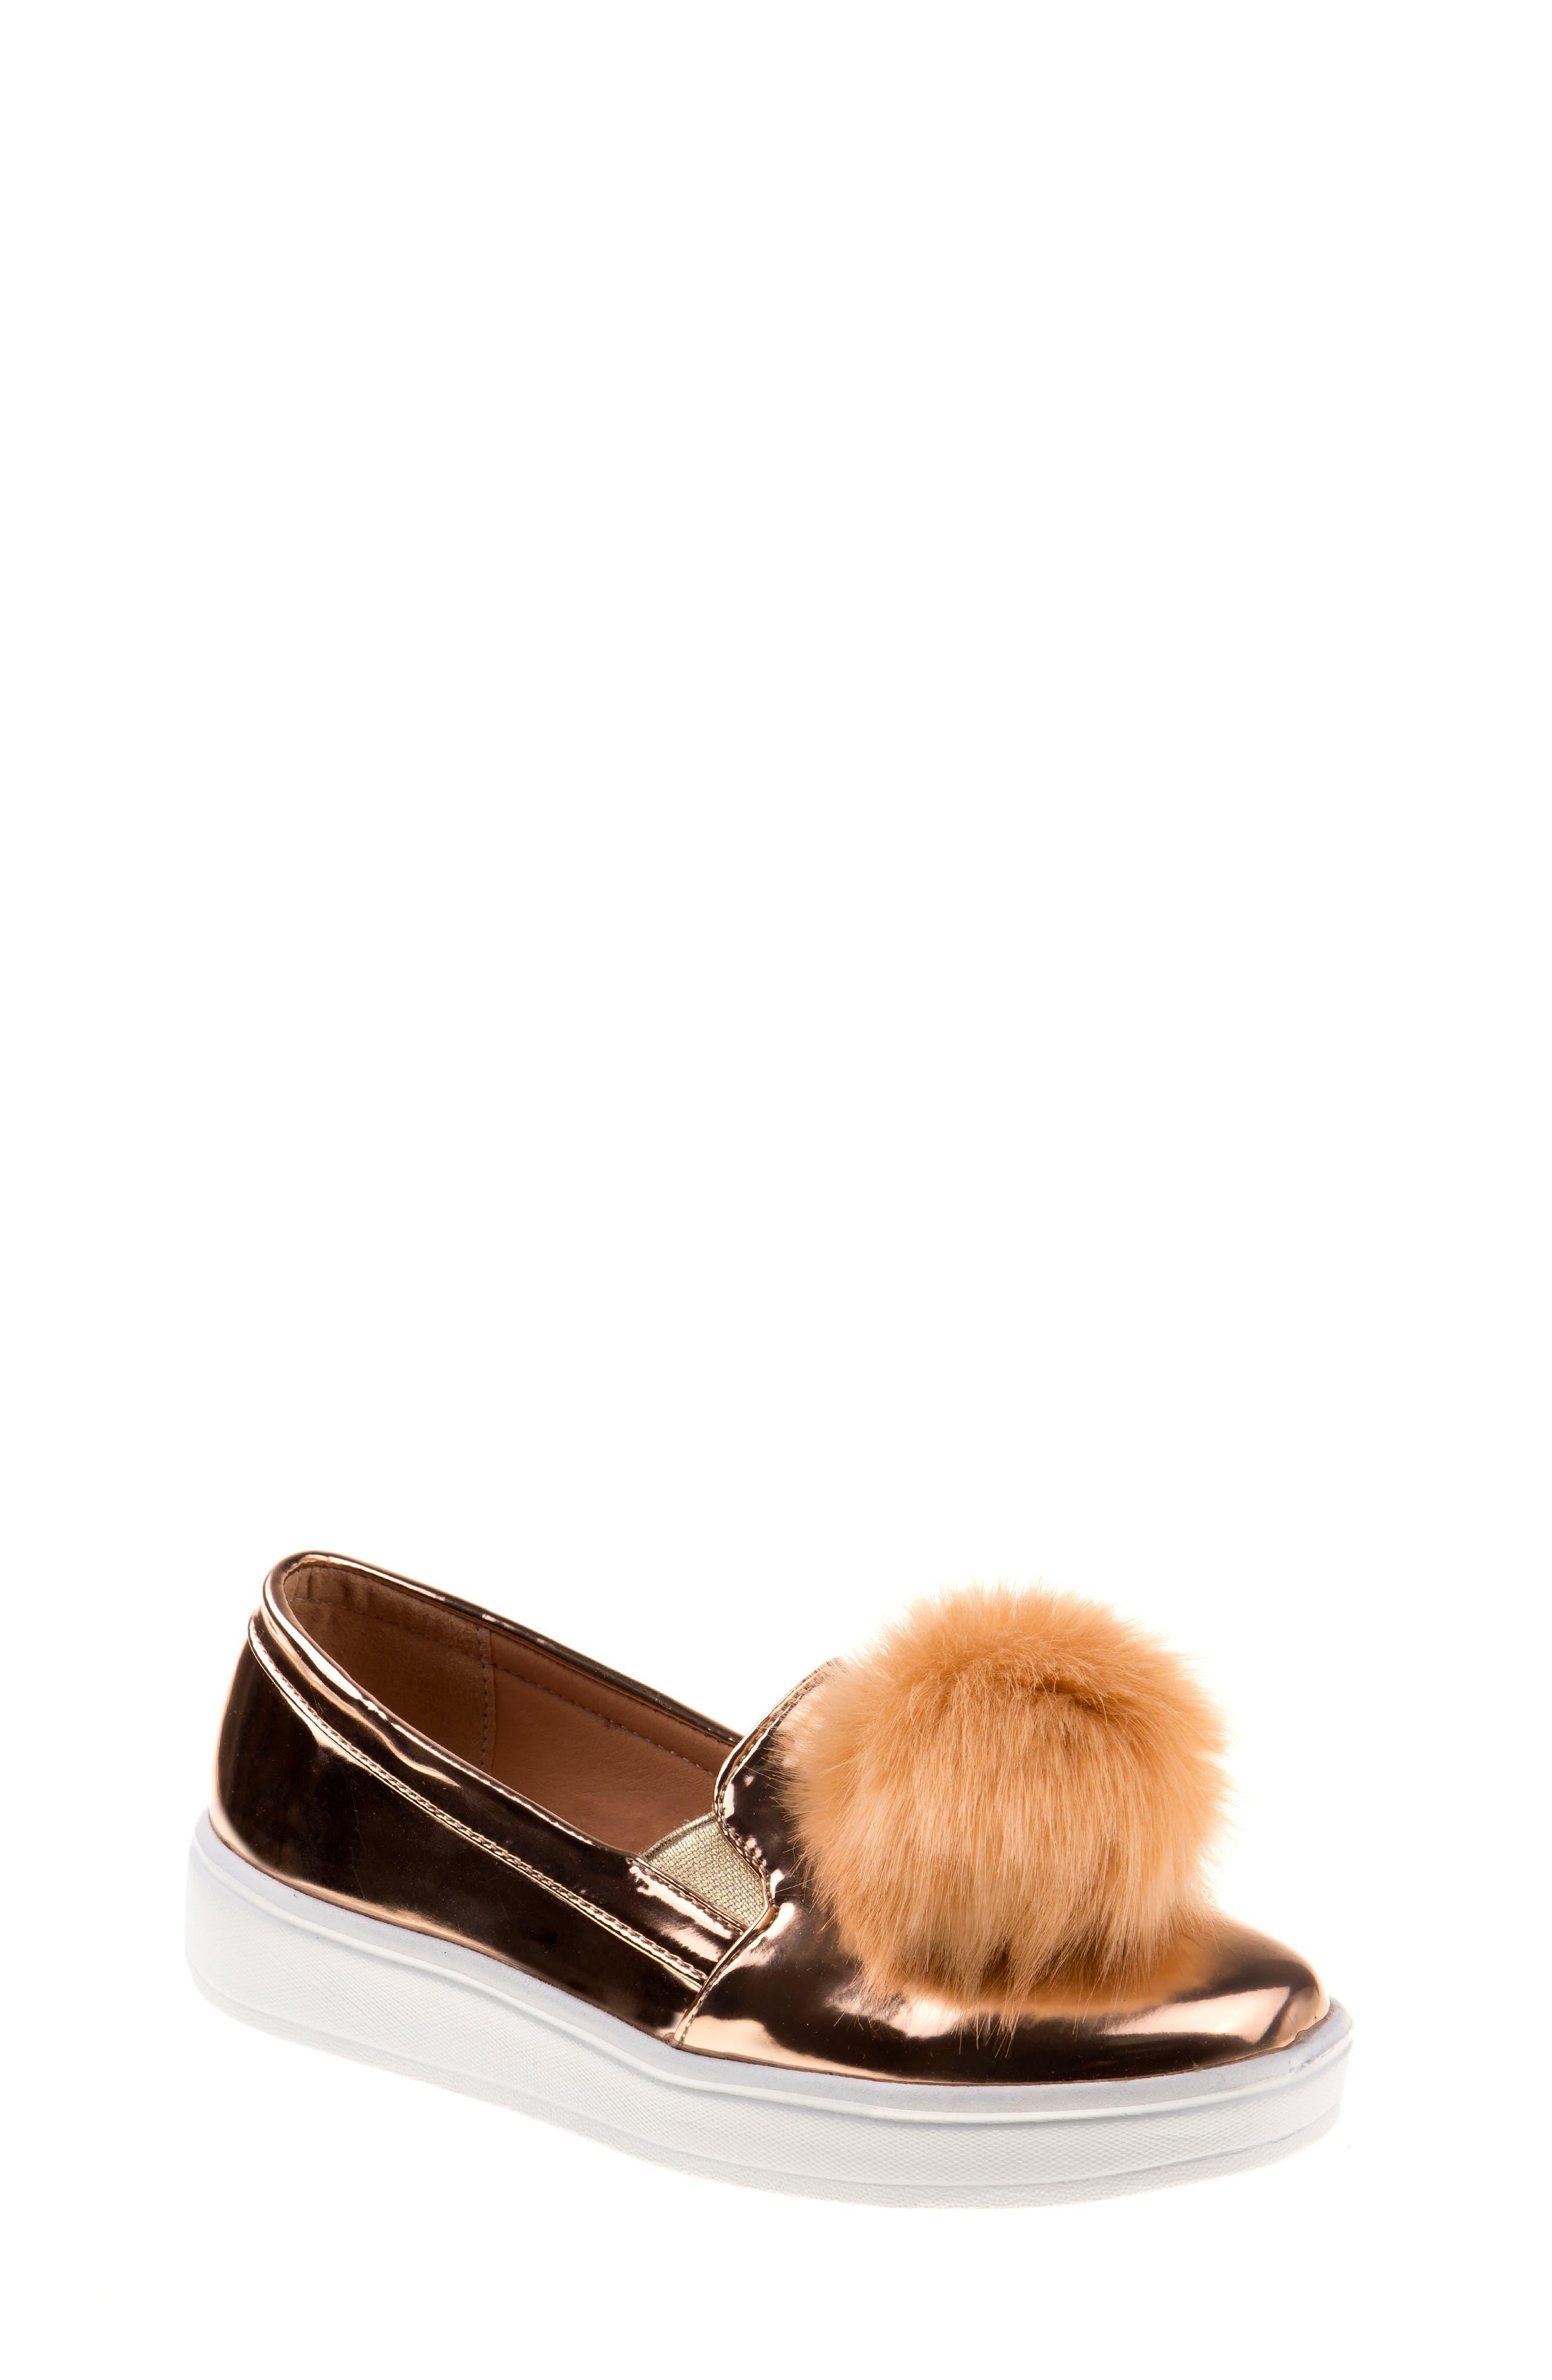 KENSIE GIRL,                             Pom Metallic Sneaker,                             Main thumbnail 1, color,                             710